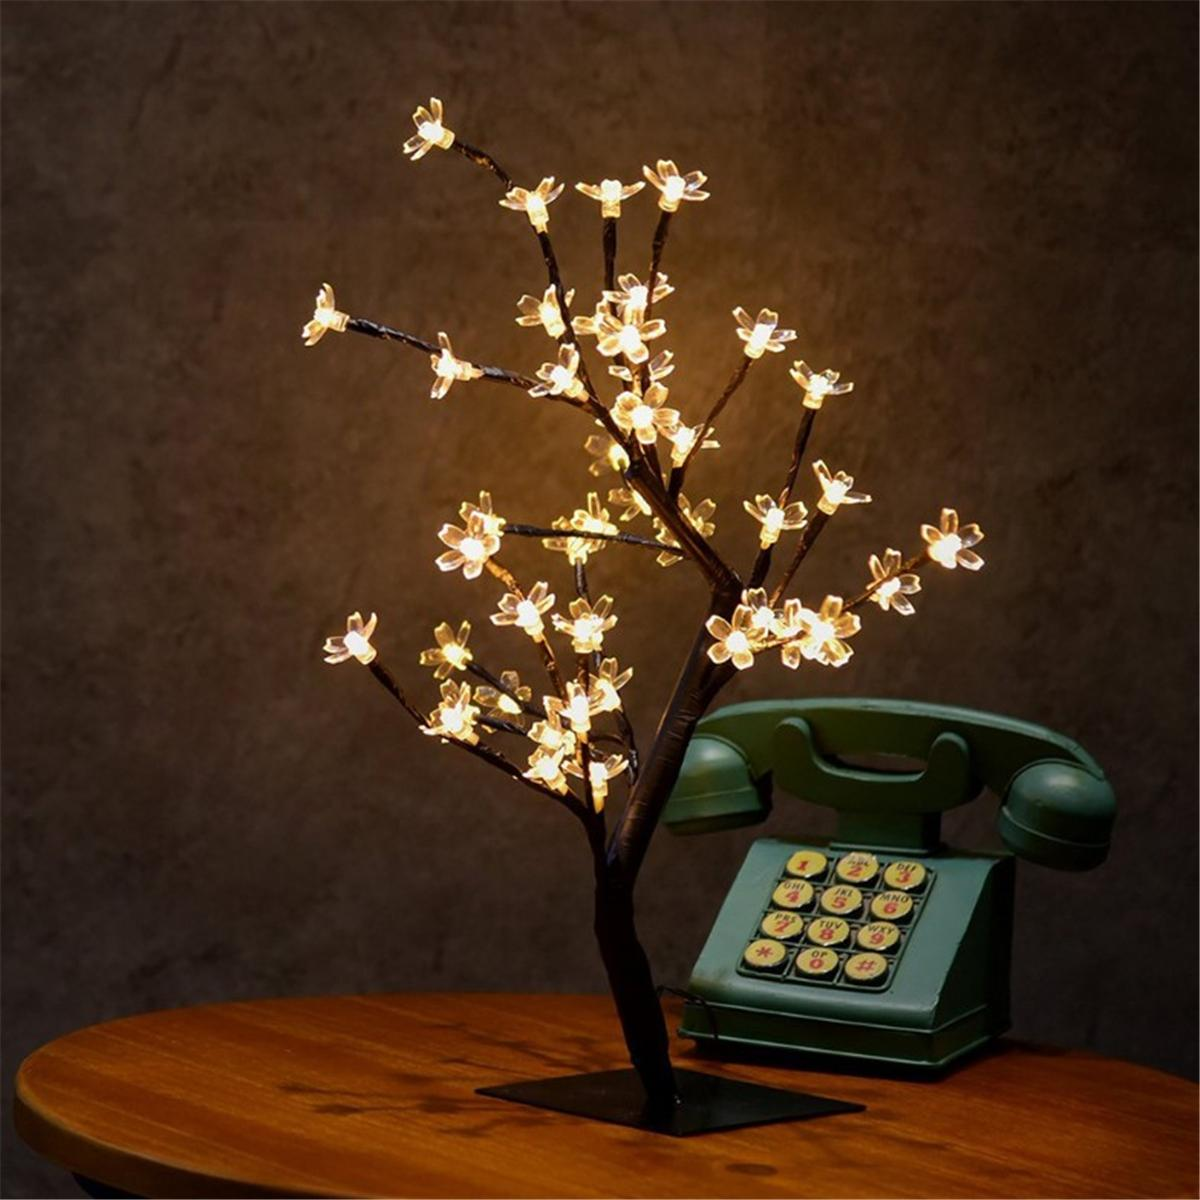 3 6w 48 Heads Led Table Lamp Cherry Blossom Tree Night Light Home